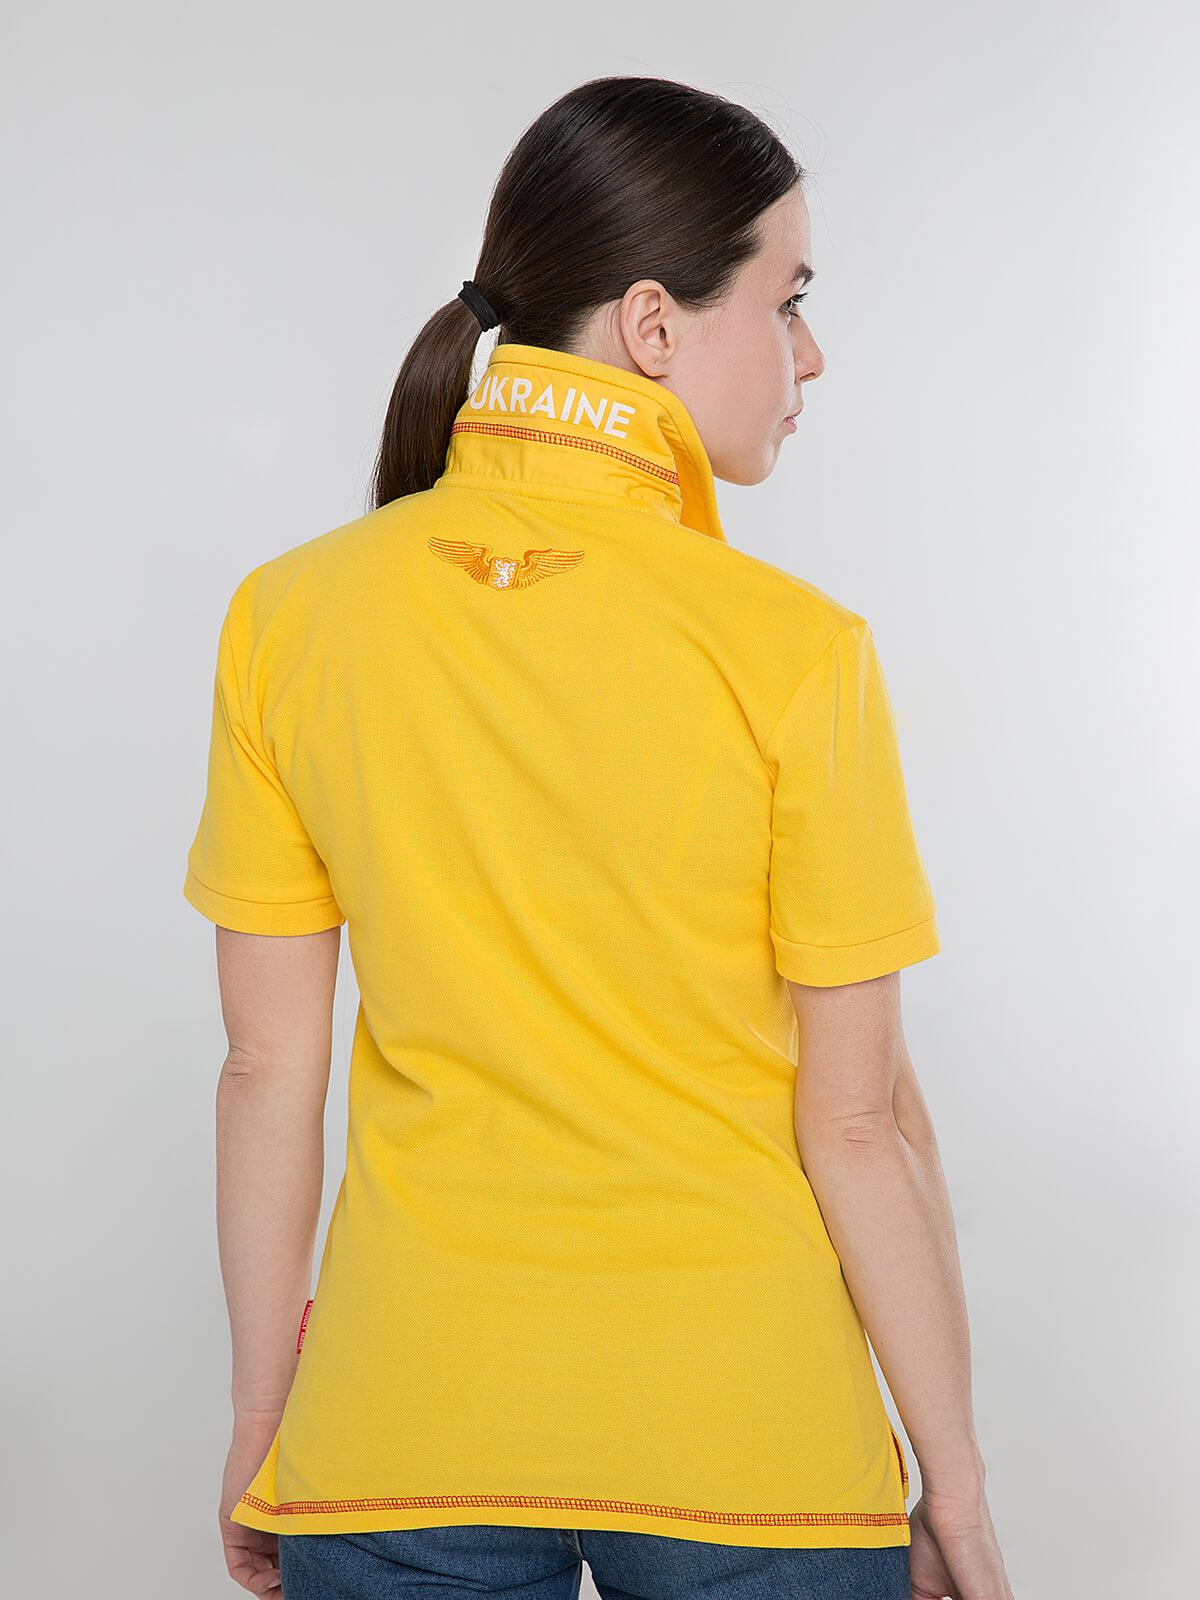 Women's Polo Shirt Wings. Color yellow.  Pique fabric: 100% cotton.